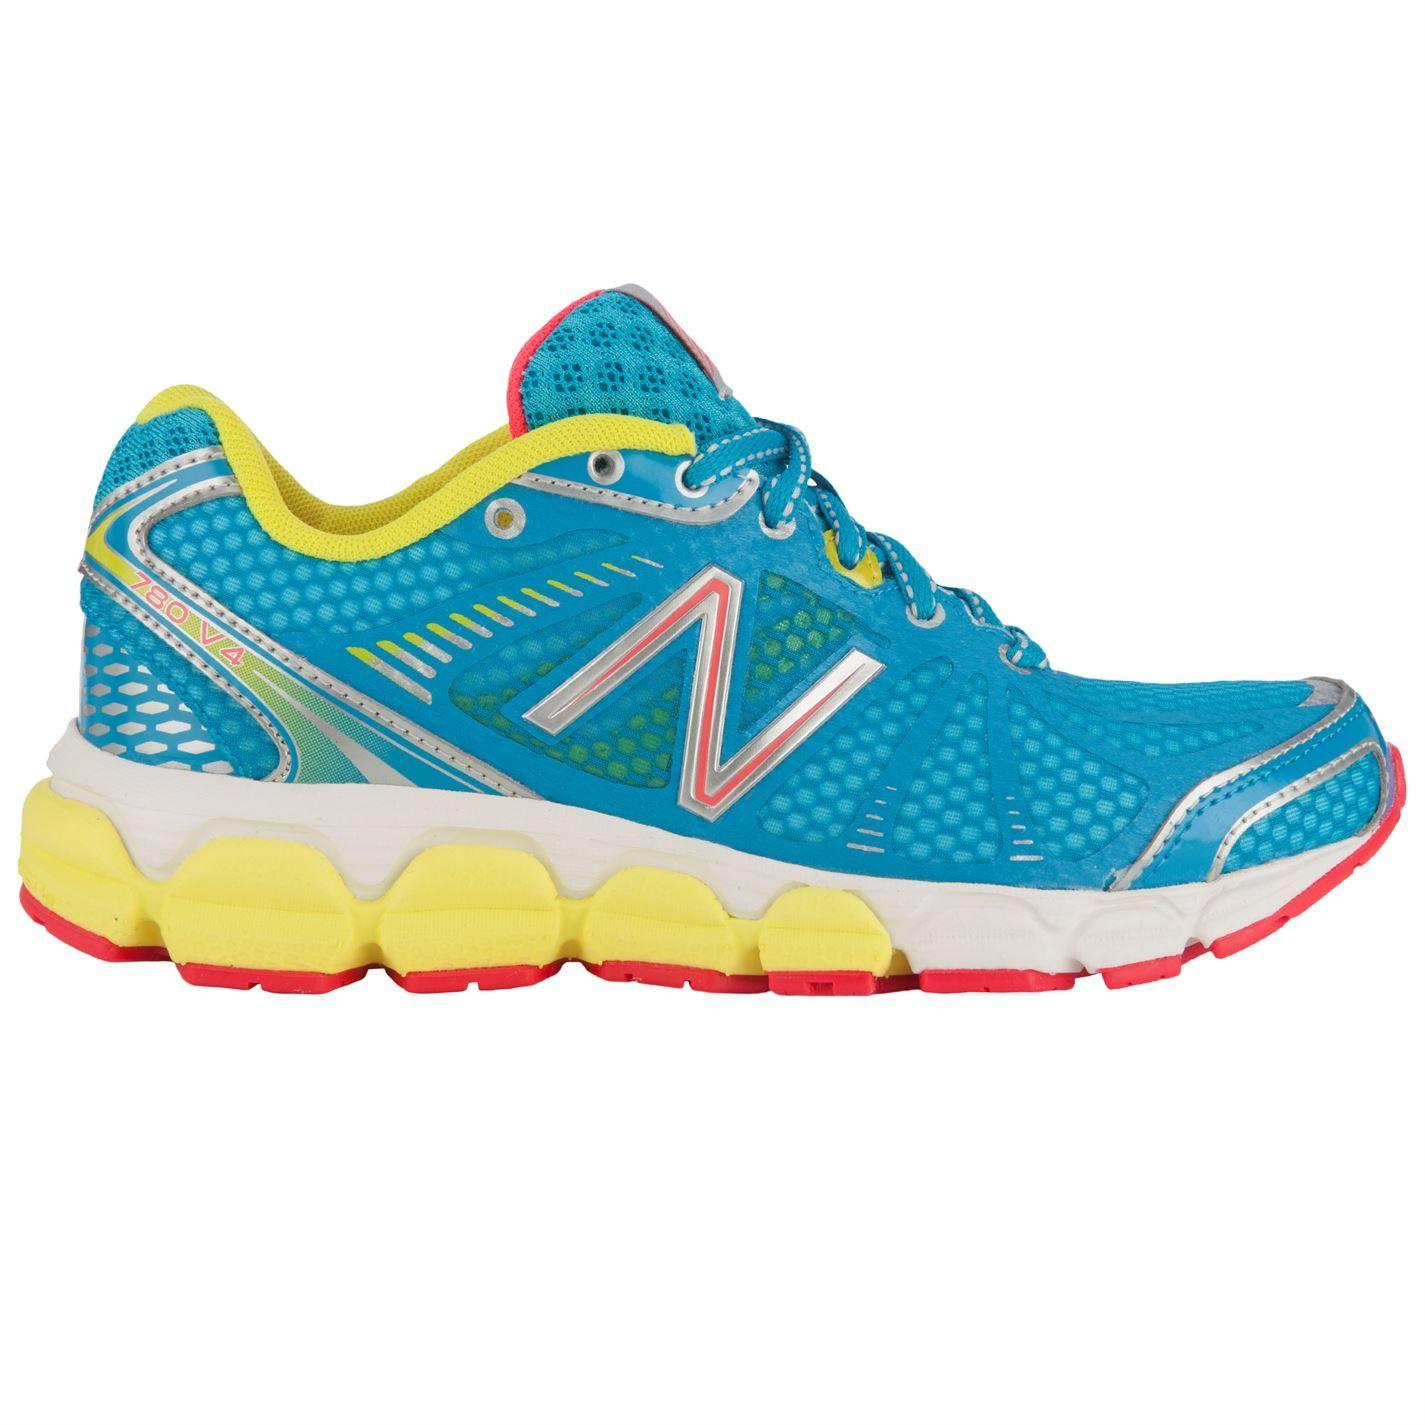 New Balance Blue Yellow Ladies Running Shoes Running Shoes Balance W780v4 Ladies